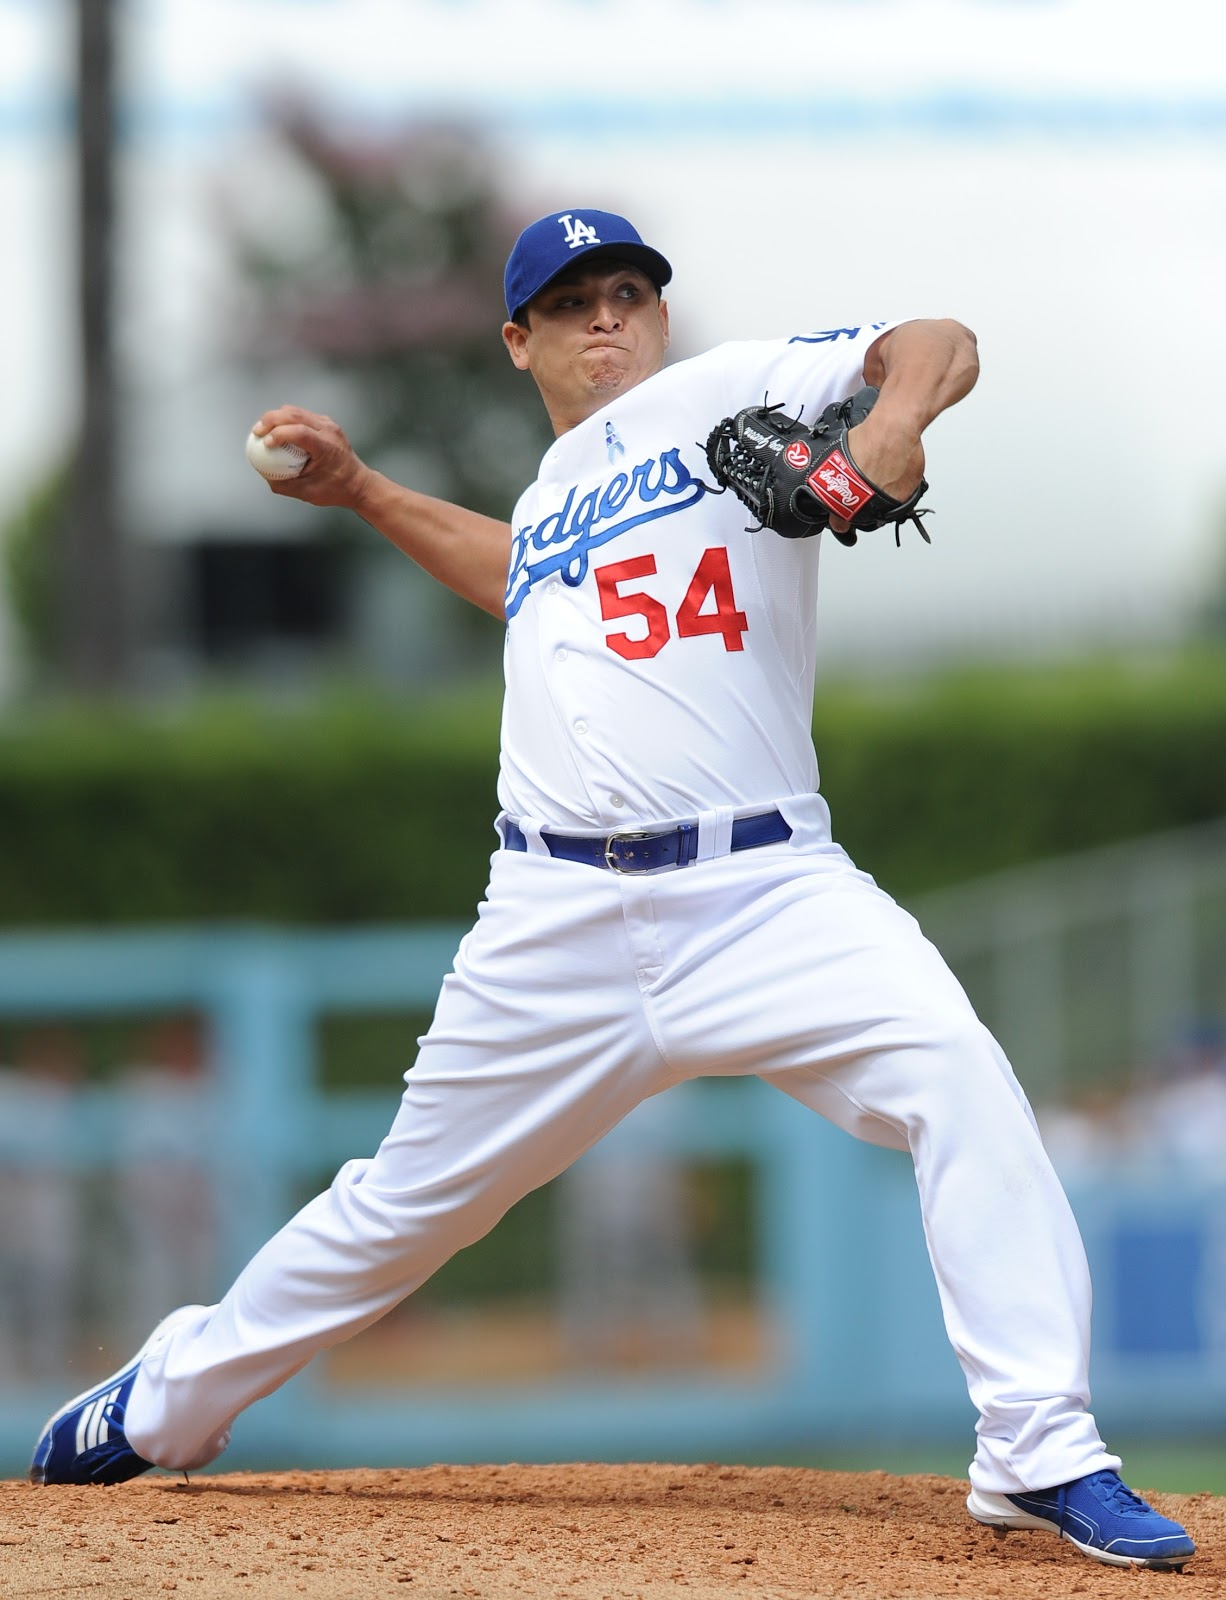 12-5. Pederson lidera lluvia de jonrones de los Dodgers